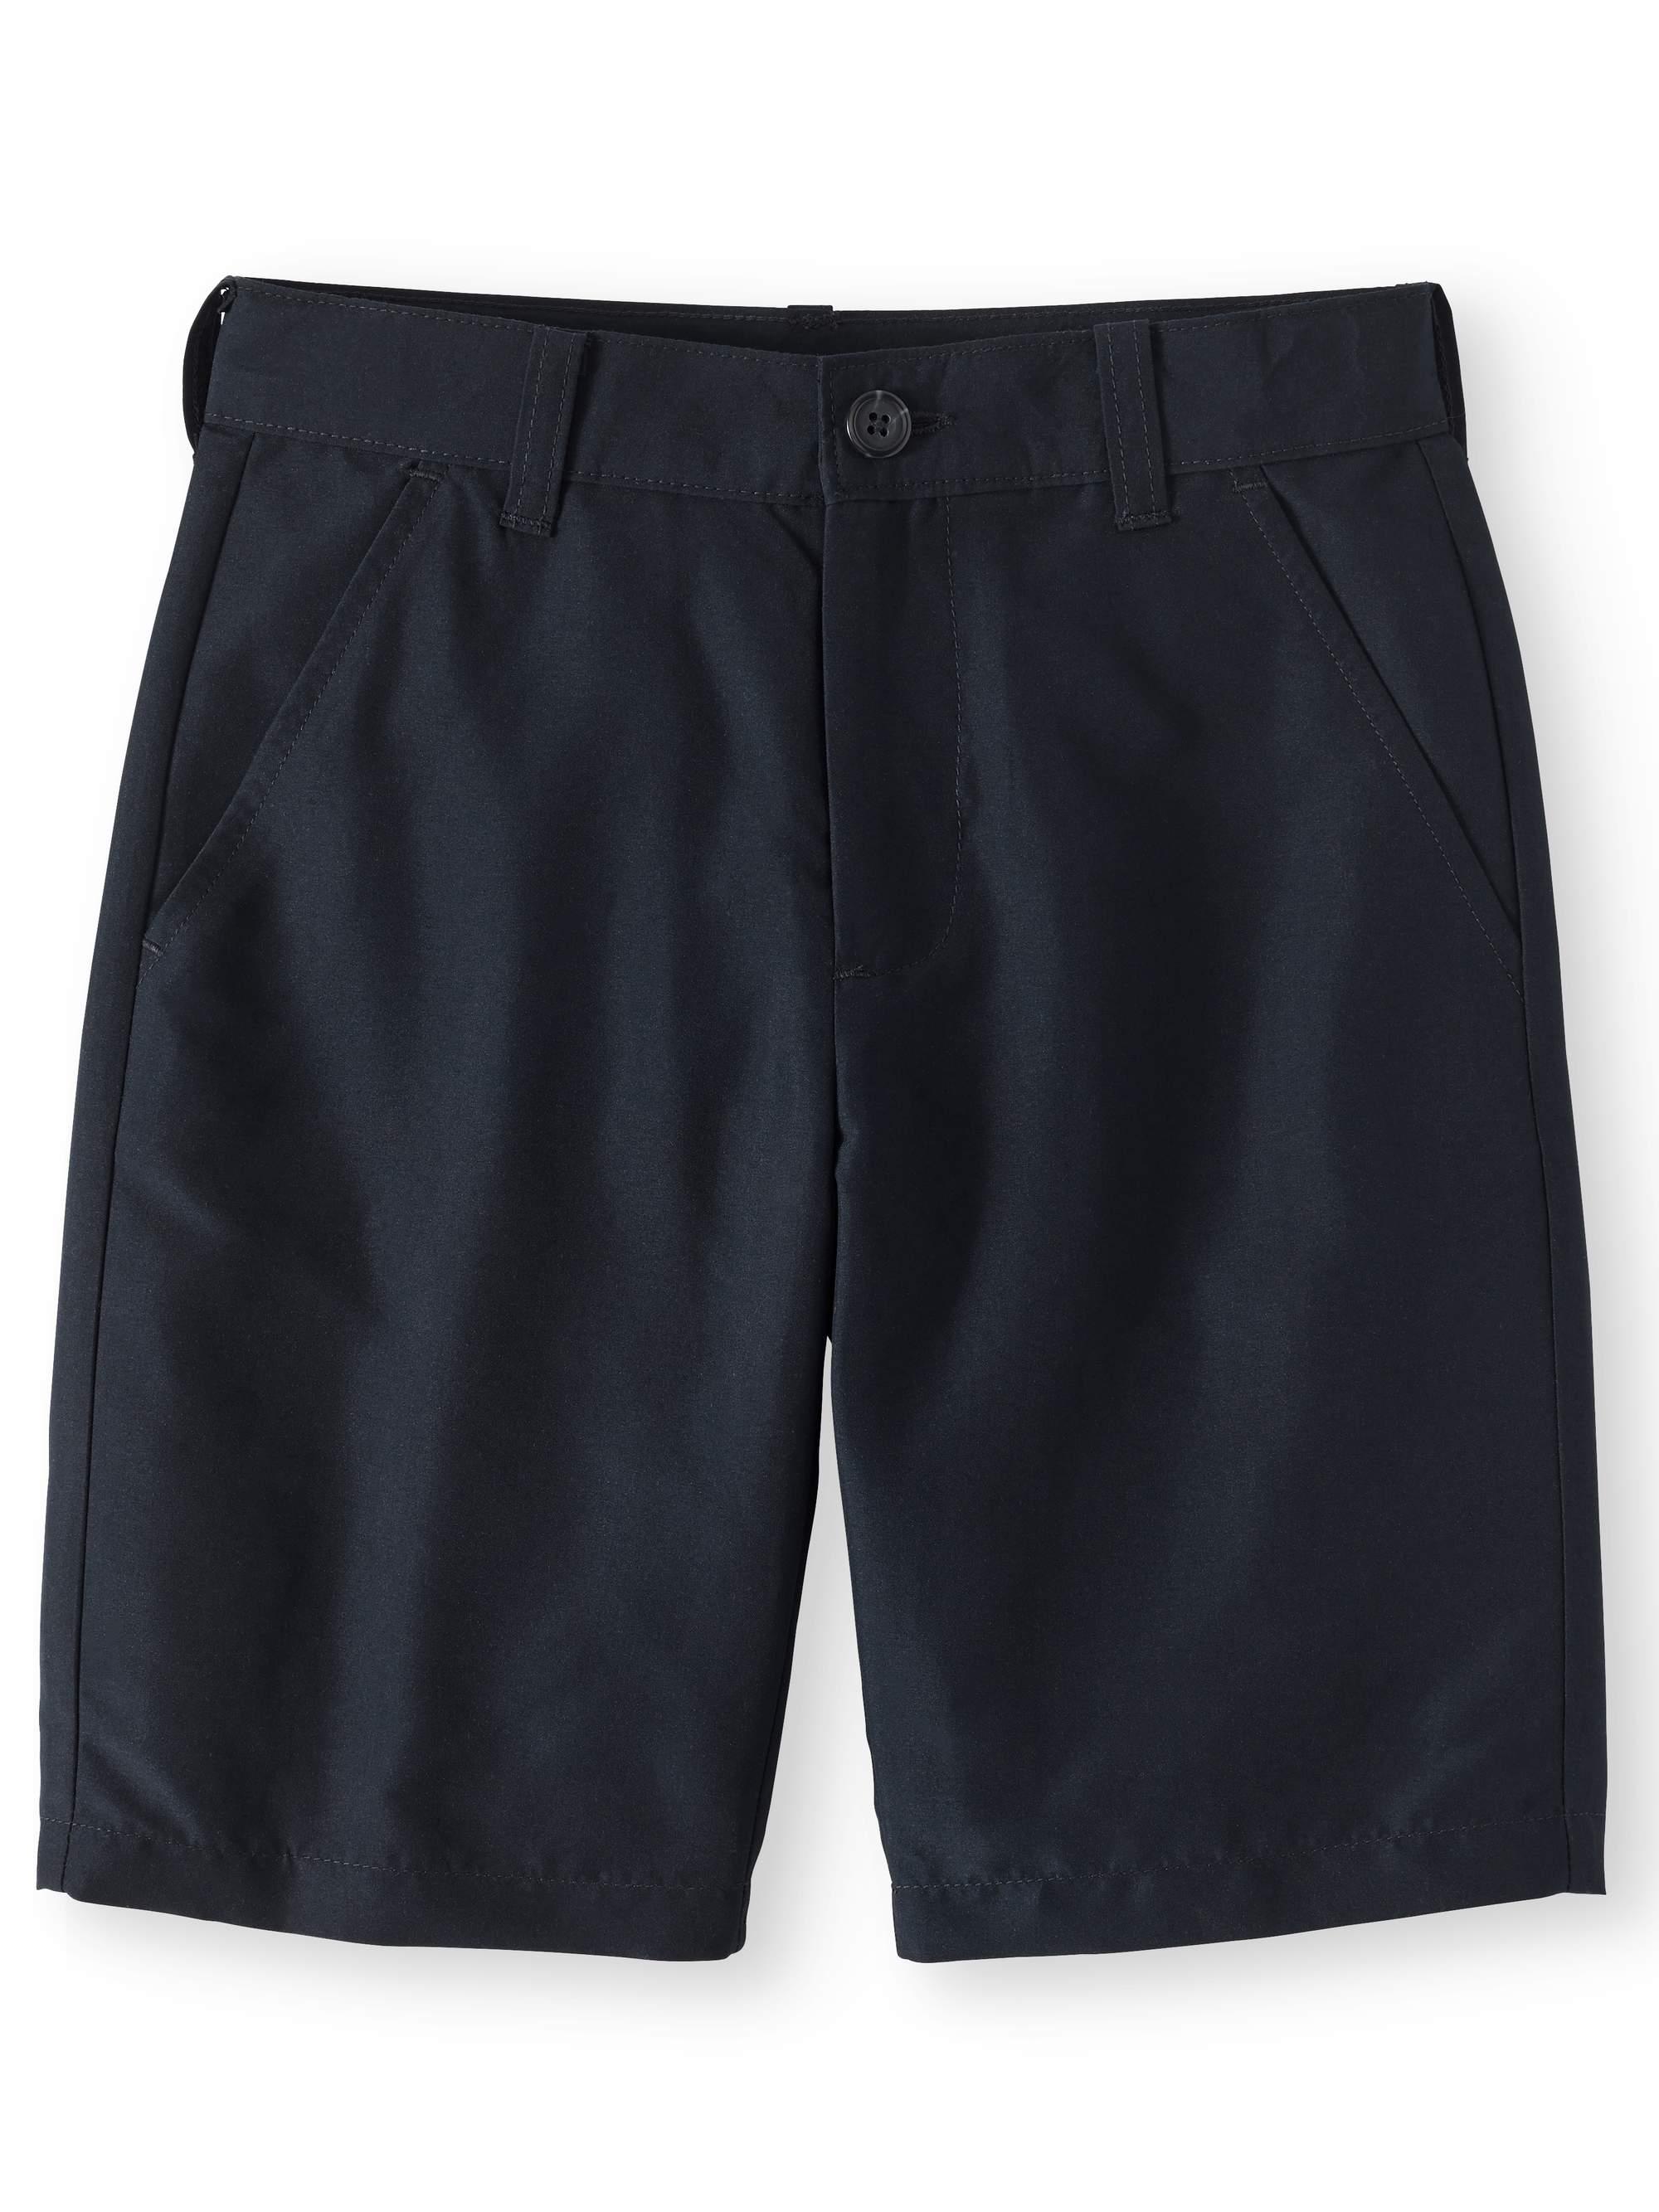 Boys School Uniform Performance Shorts